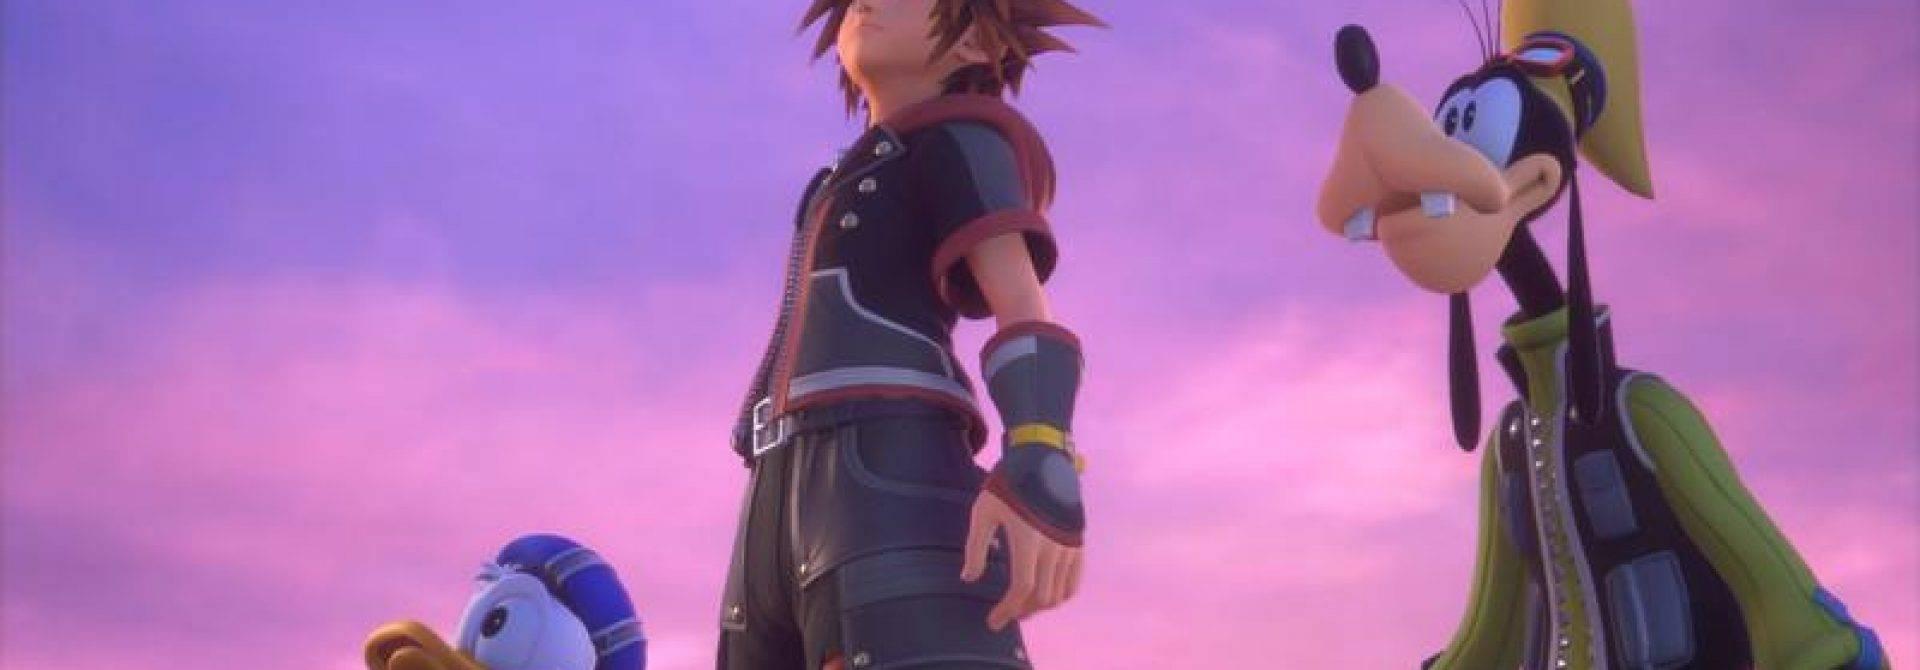 Kingdom Hearts 3: Final Battle Trailer